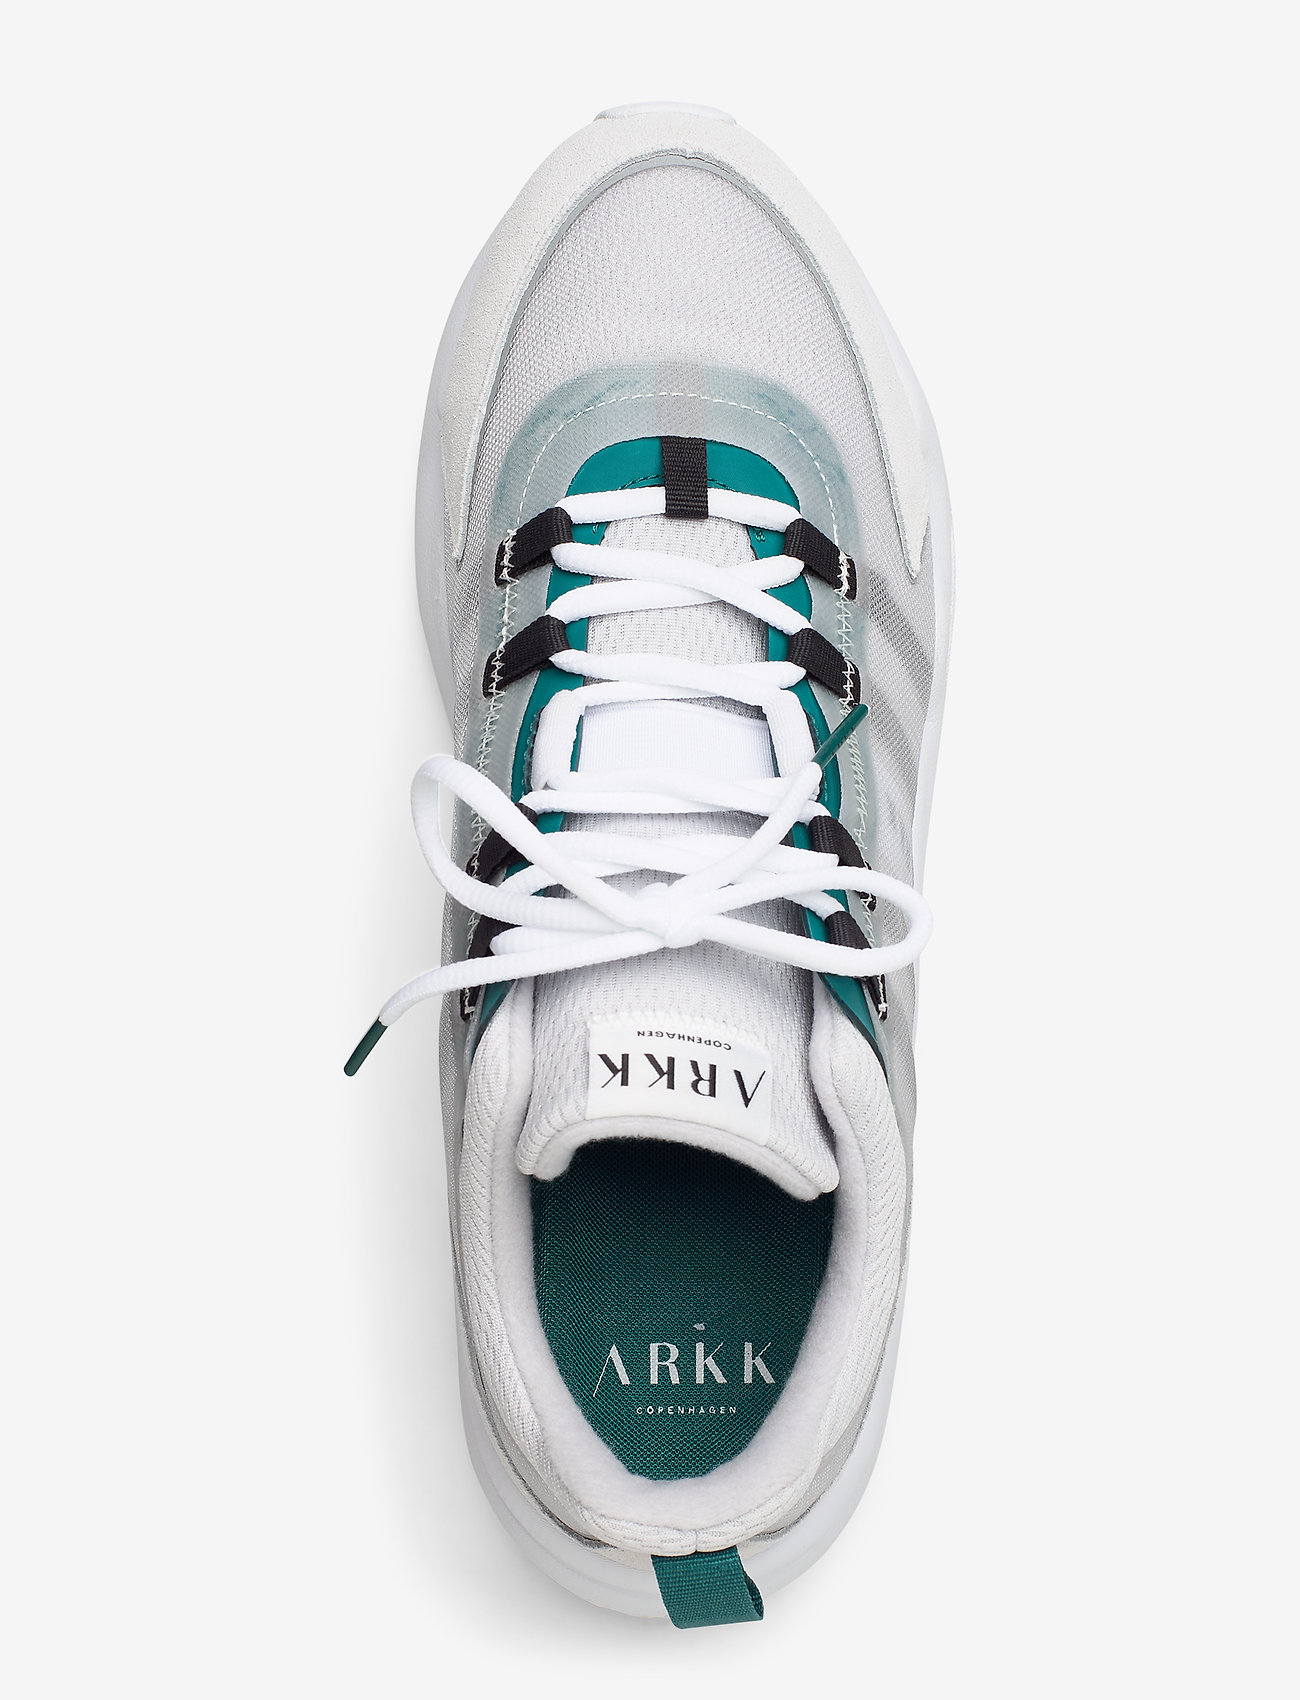 Arkk Copenhagen Lyron Mesh F-pro90 Soft Grey Teal - Sneakers